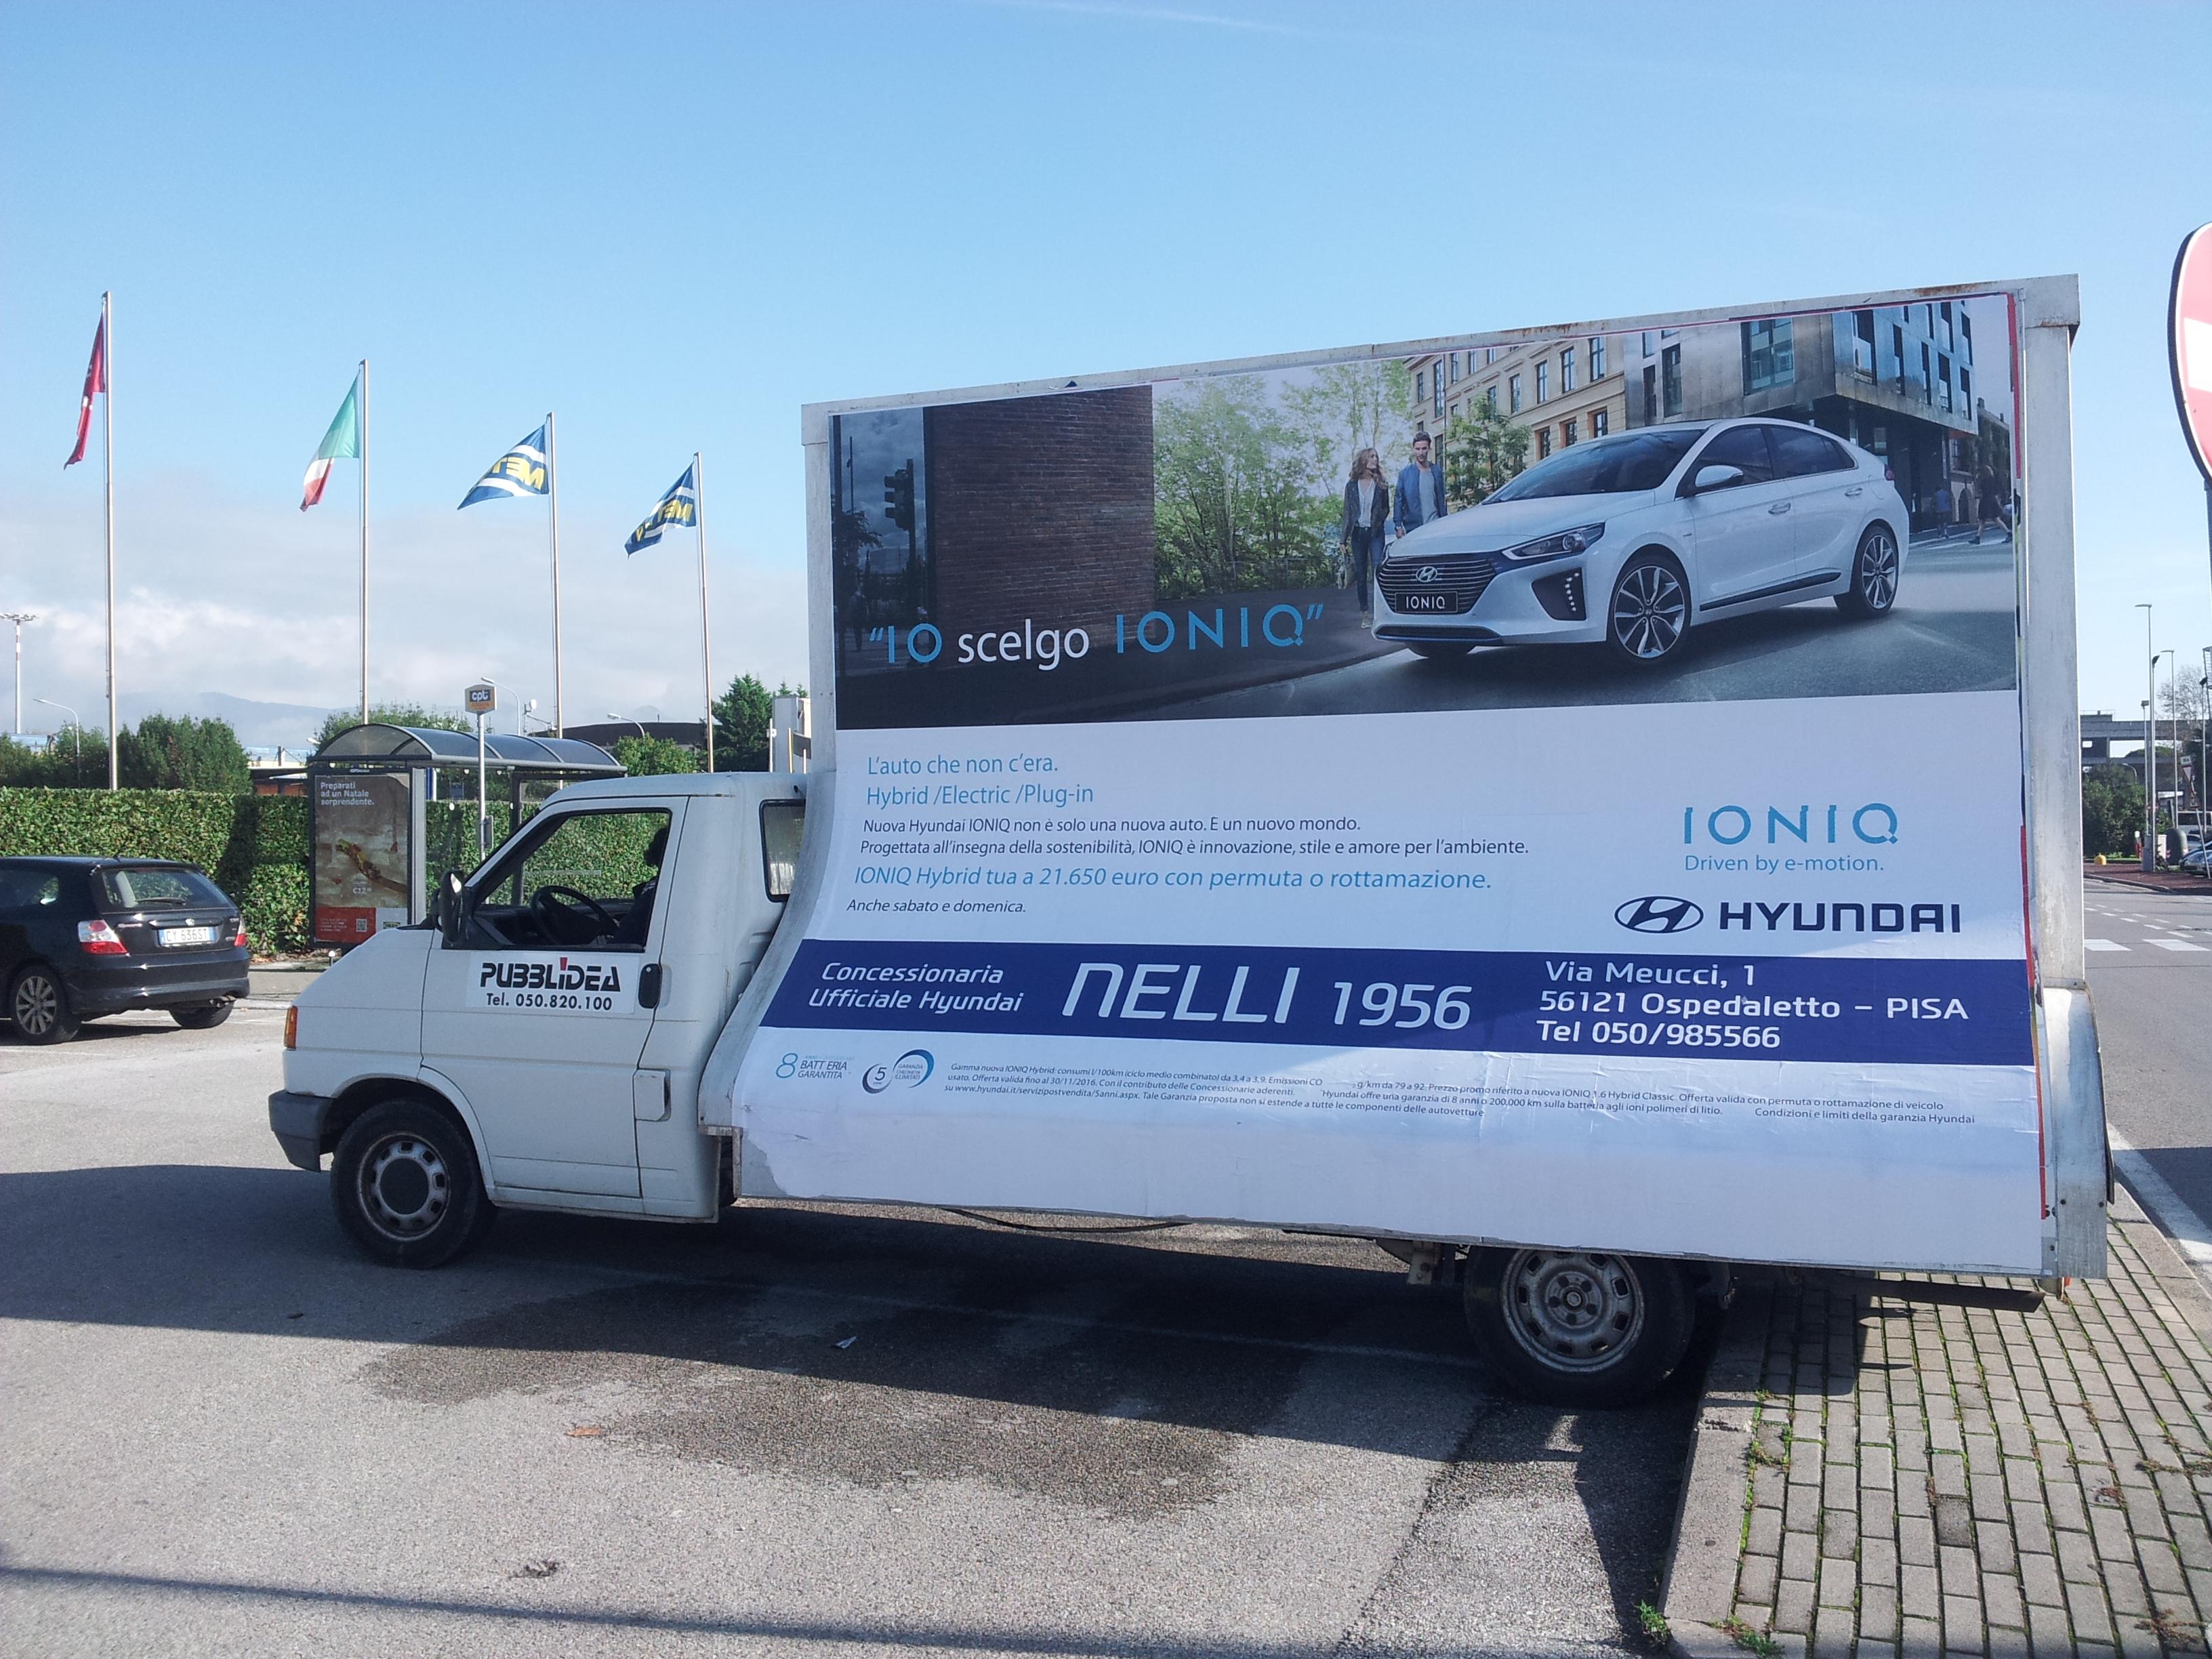 camion vela Pisa livorno lucca, camion pubblicità pisa lucca livorno